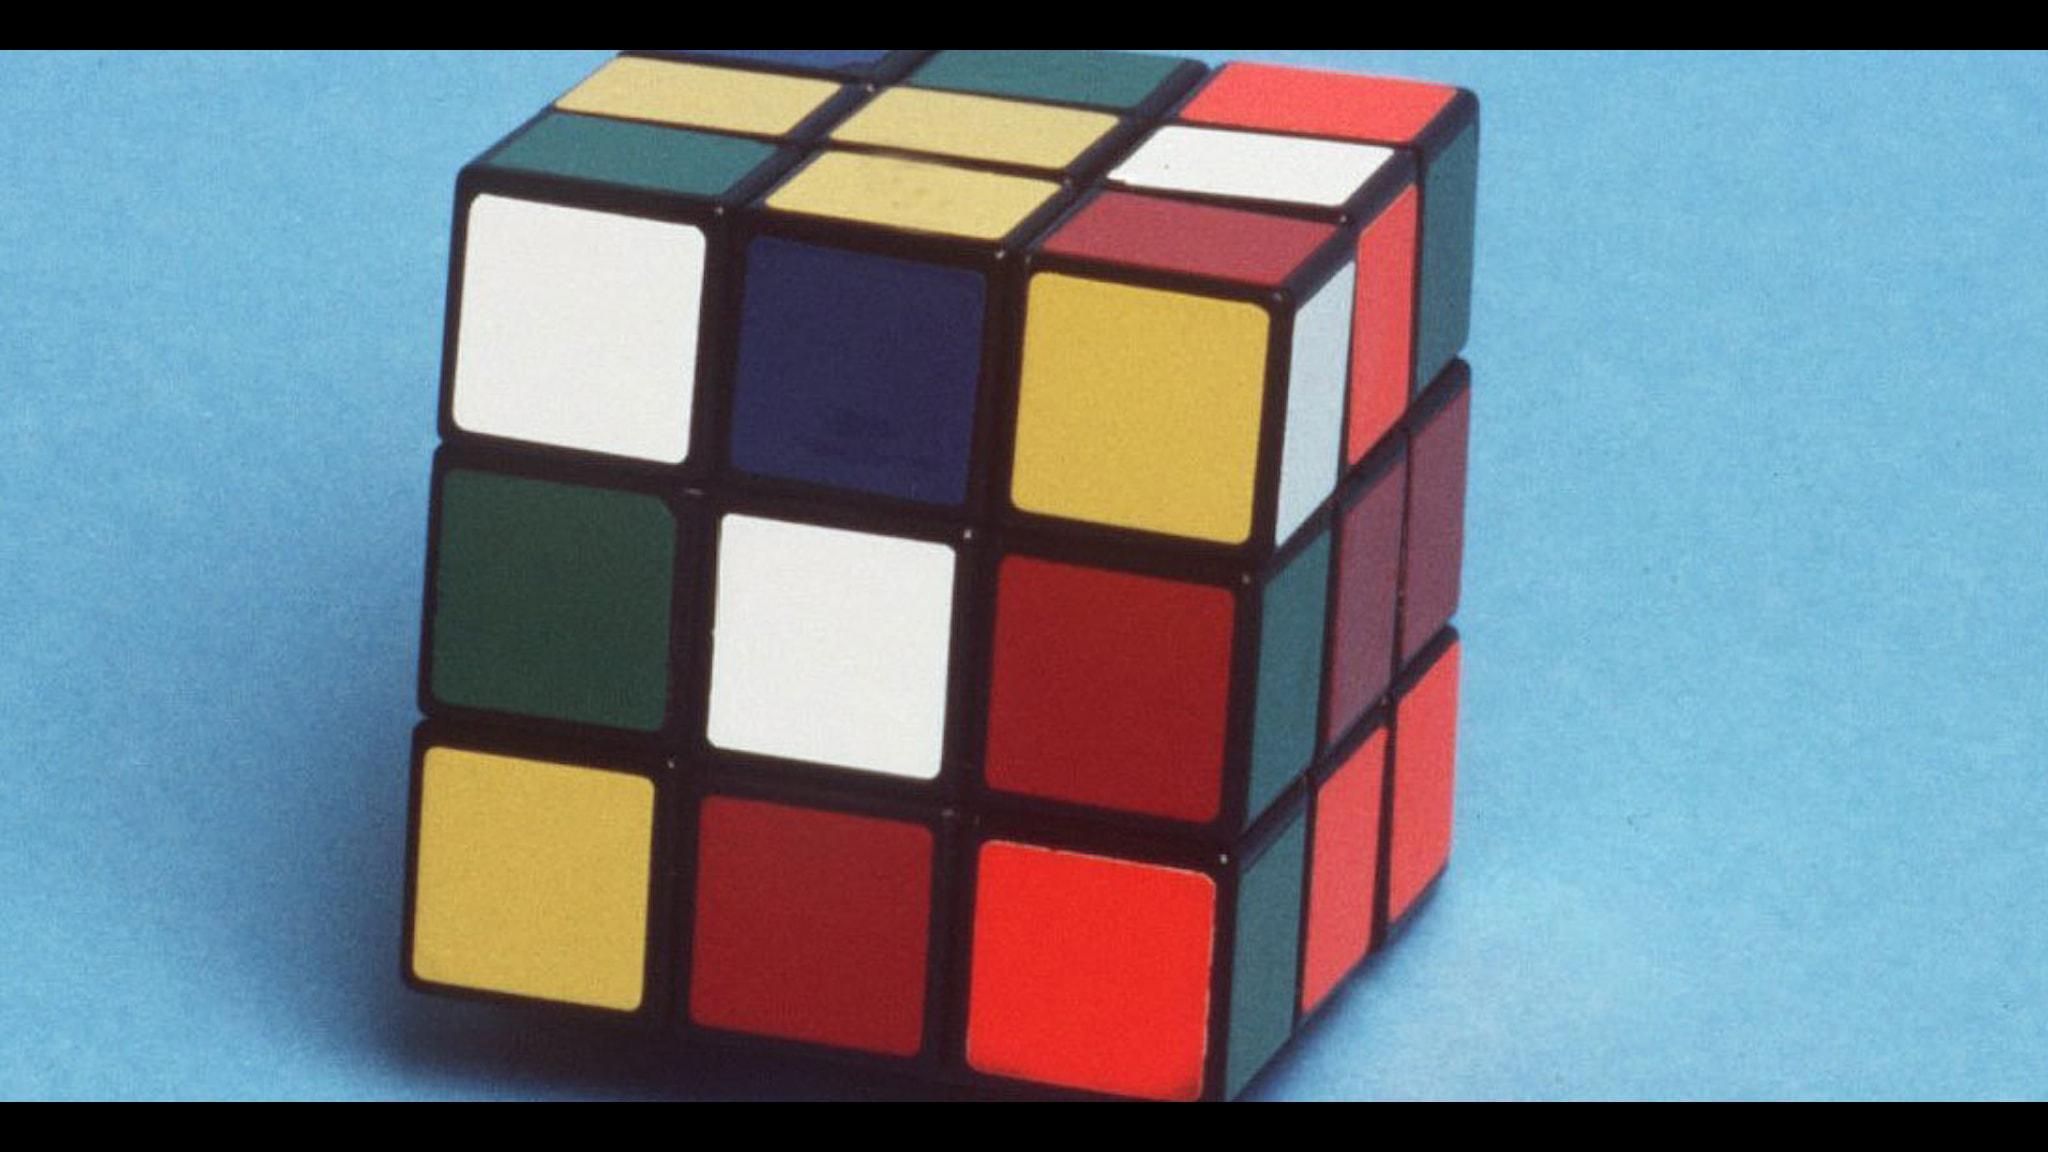 Rubiks kub. Foto: Scanpix.